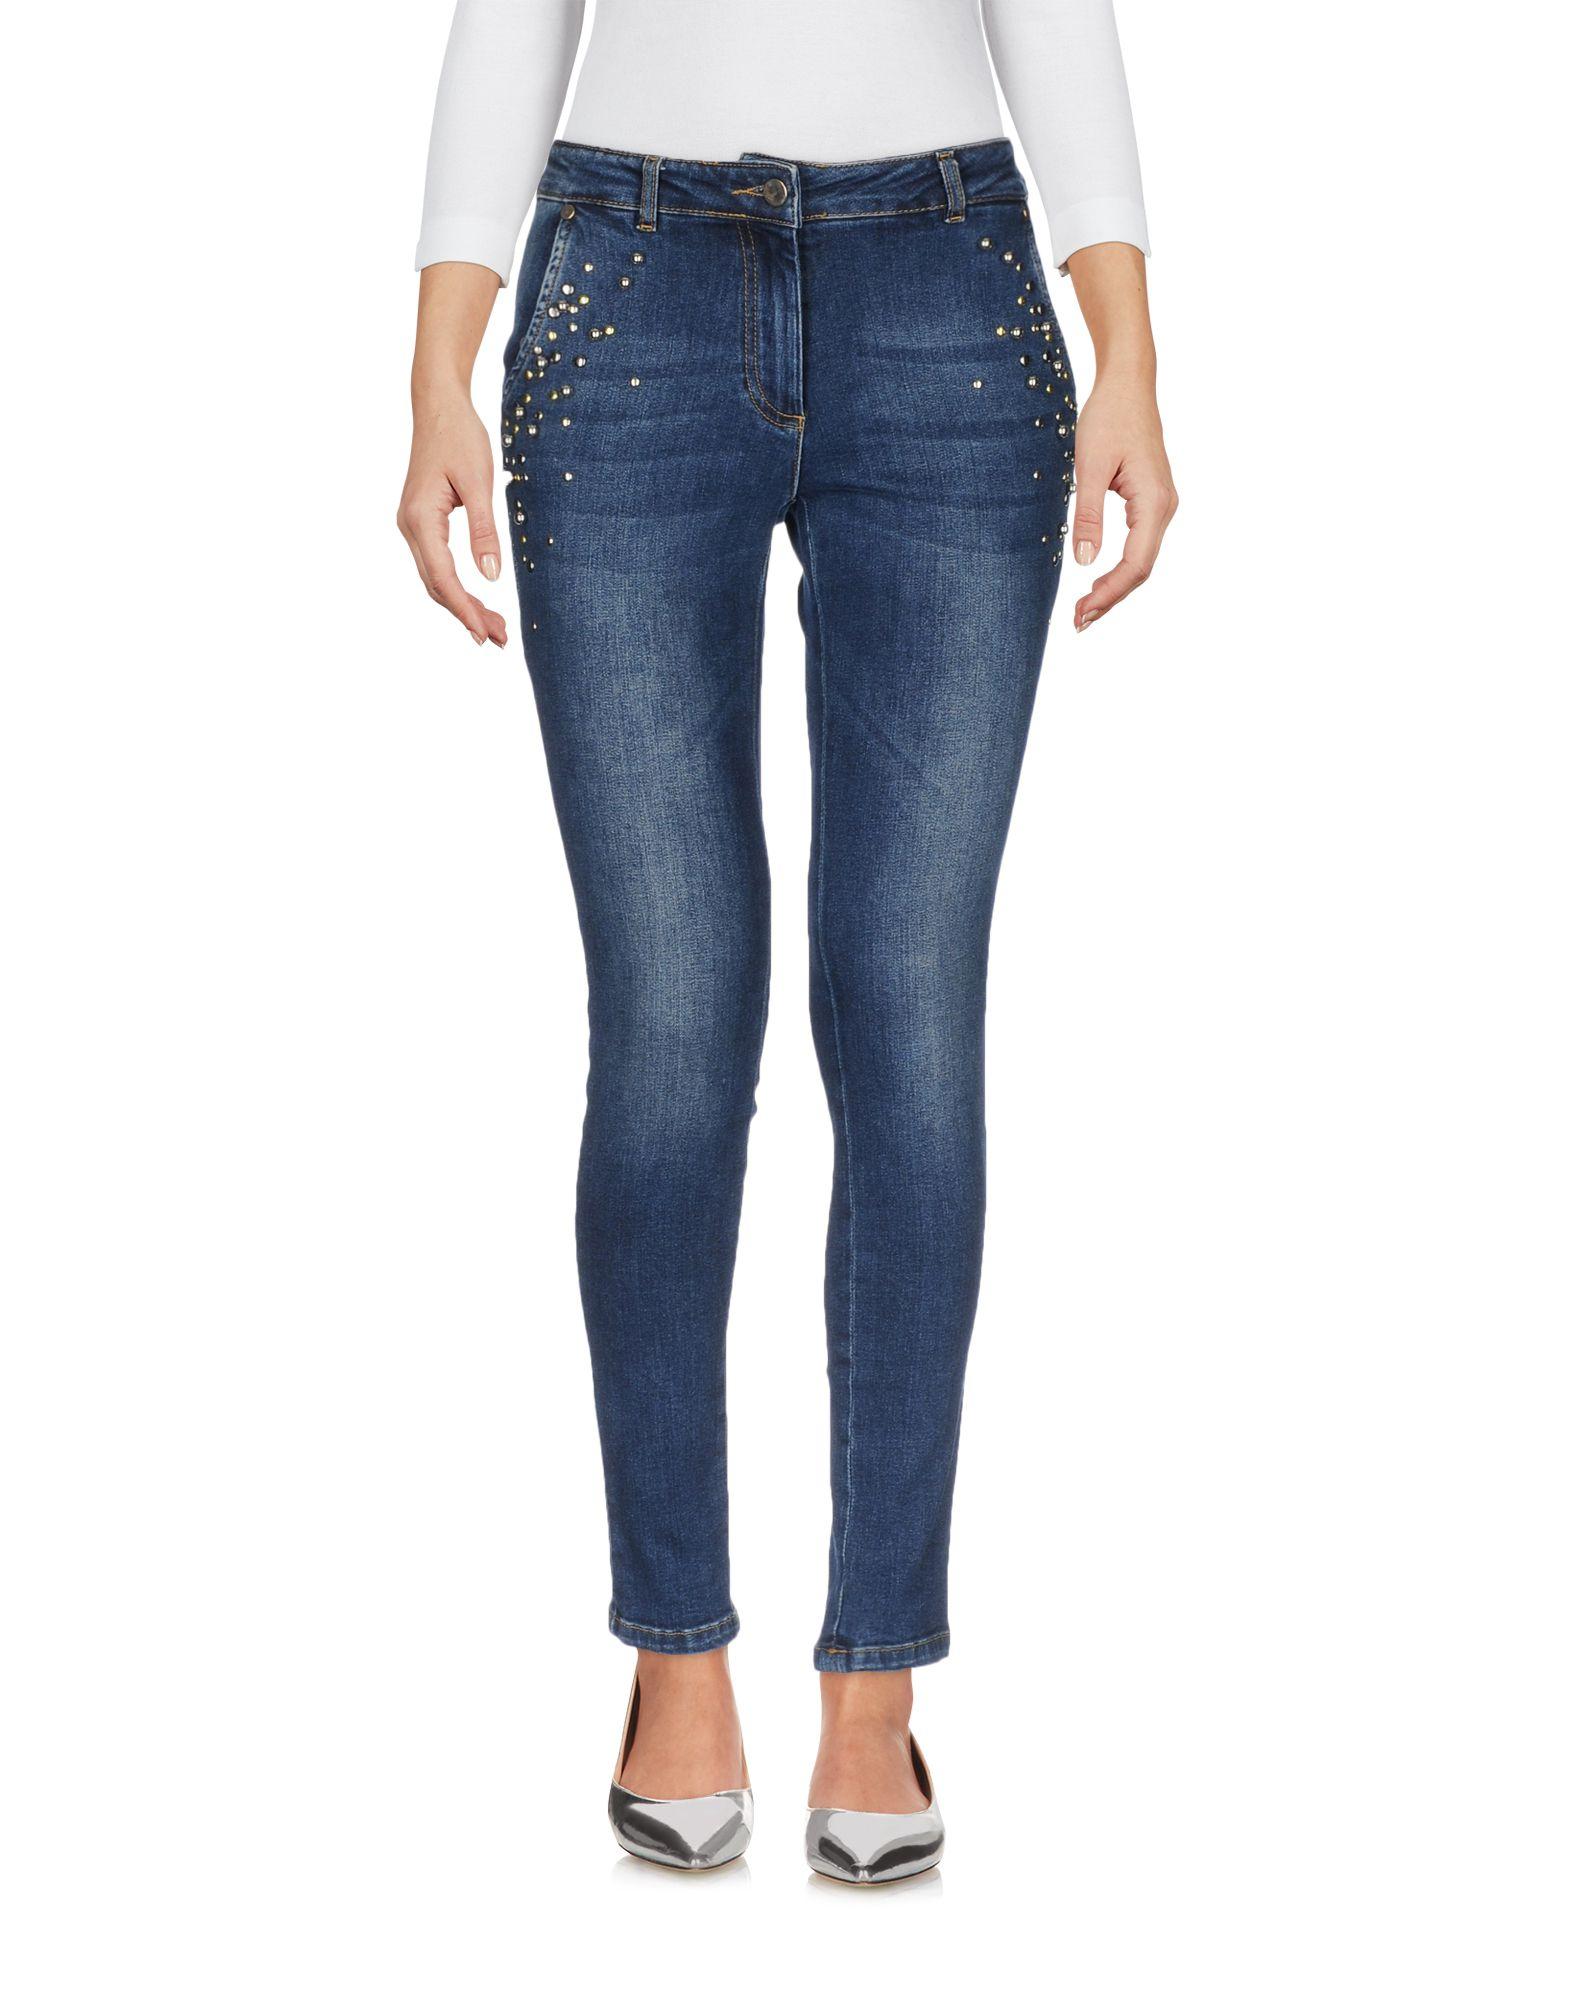 CRISTINA GAVIOLI JEANS Джинсовые брюки брюки cristina gavioli брюки широкие